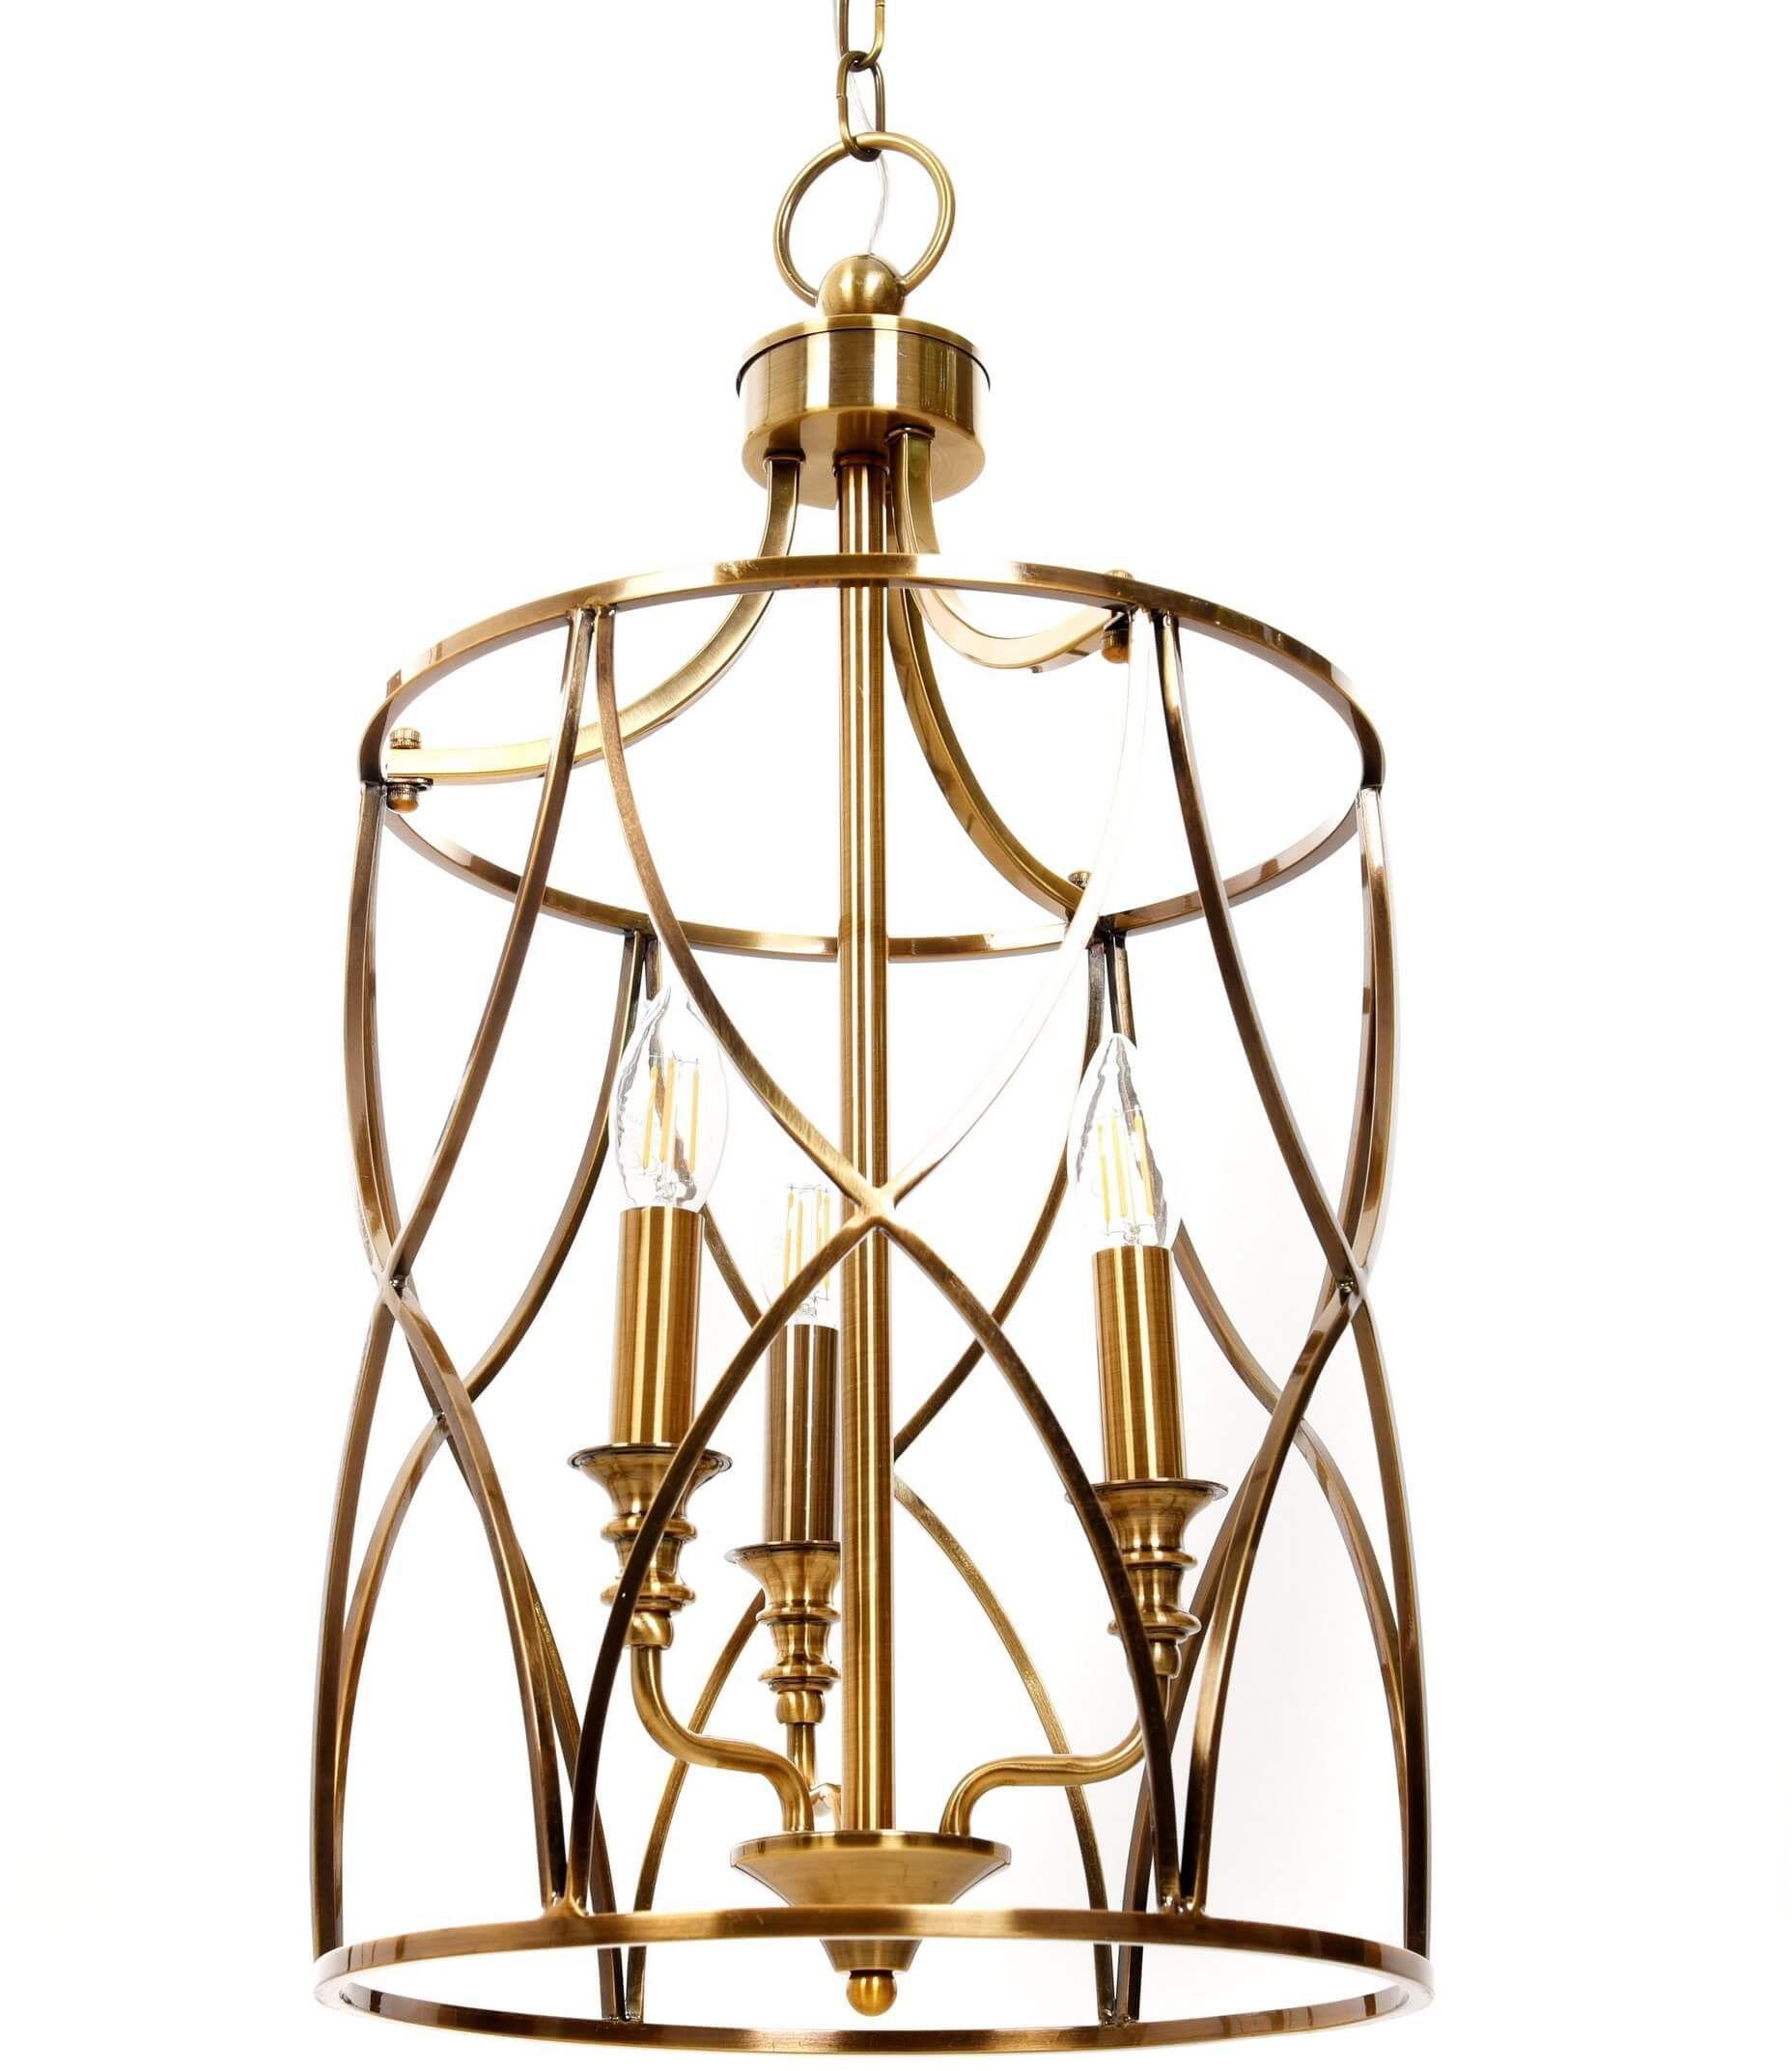 LAMPA SUFITOWA ART DECO MOSIĘŻNA ELMONT W3